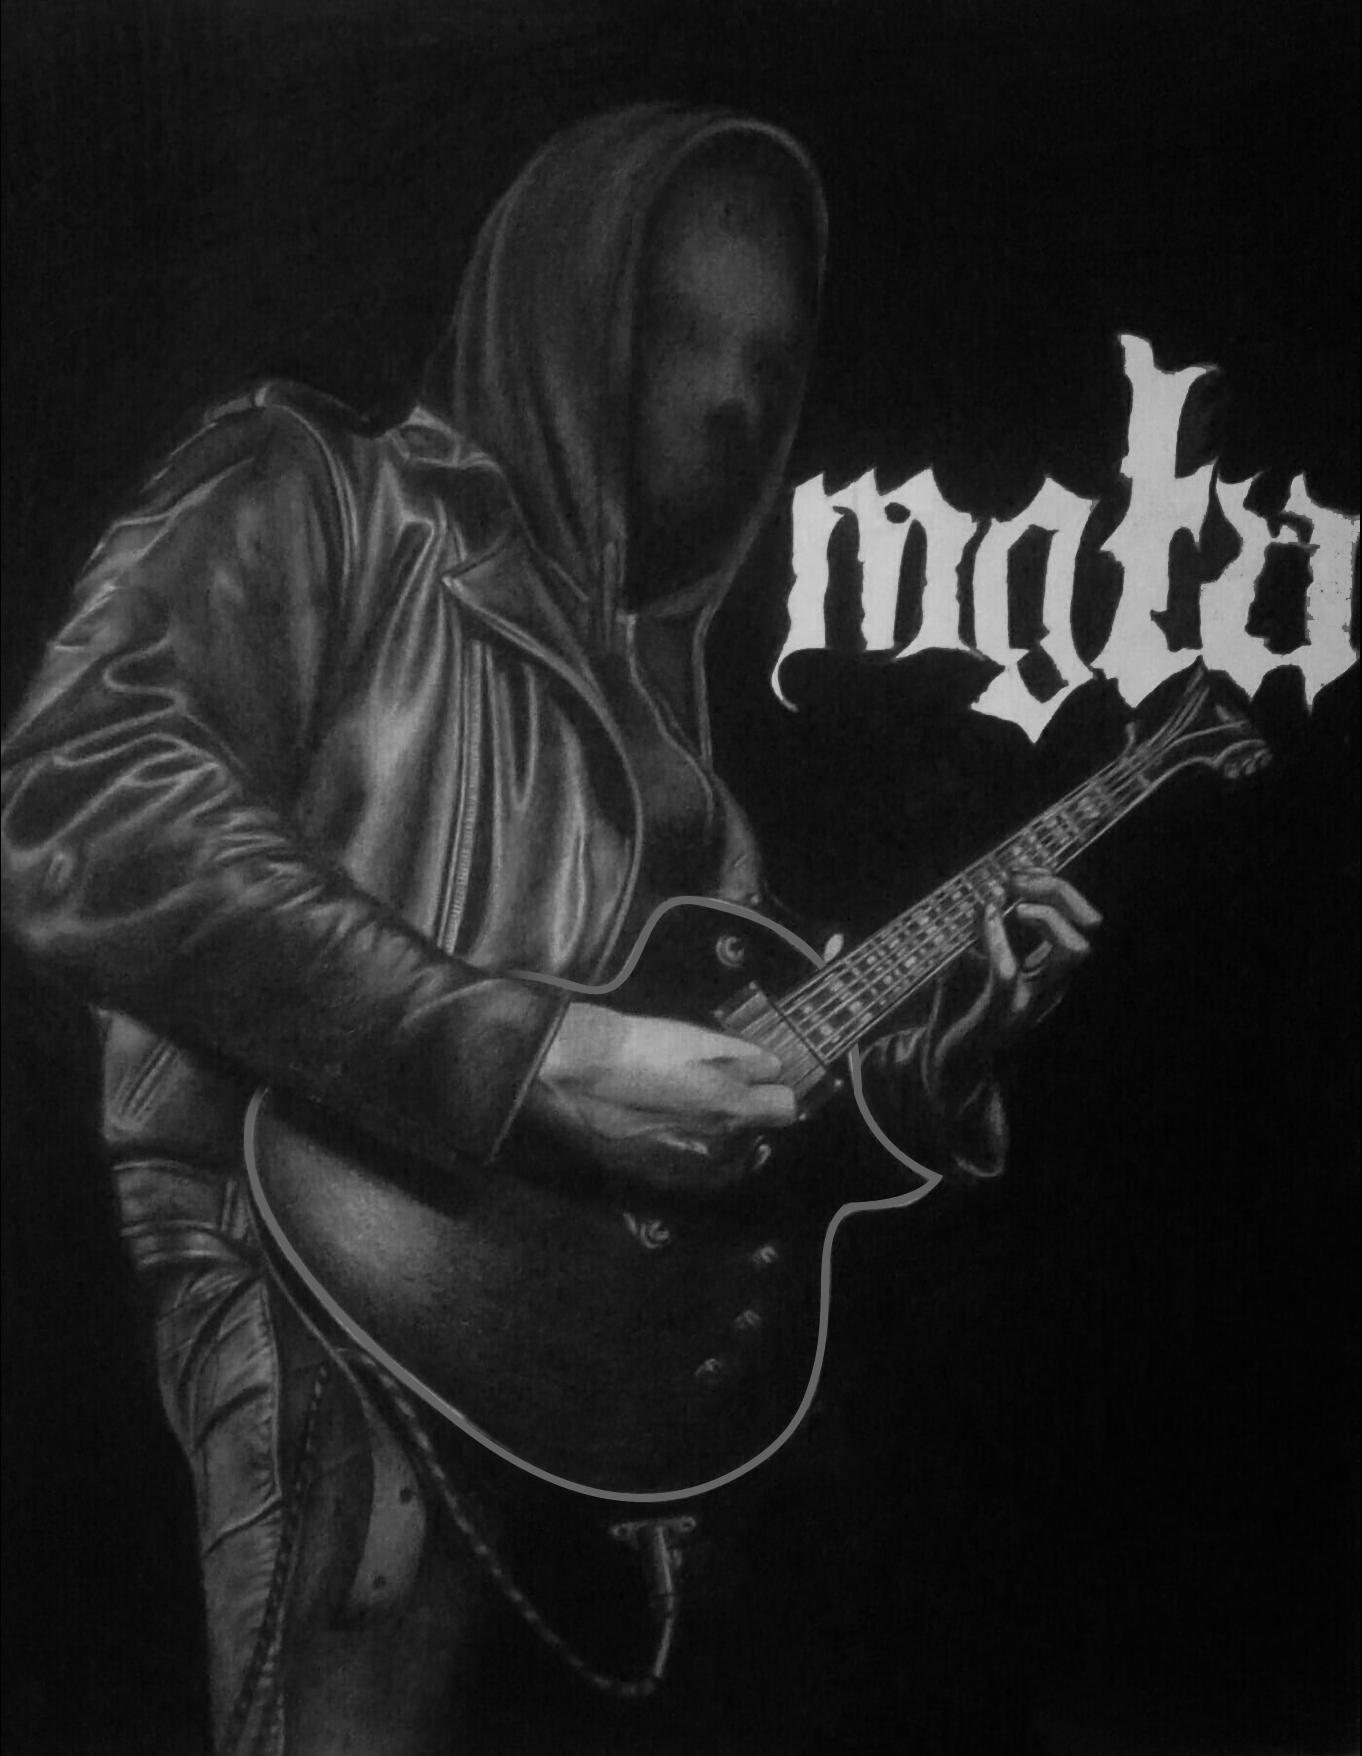 Mgła Fan Art Black Metal Art Extreme Metal Black Metal